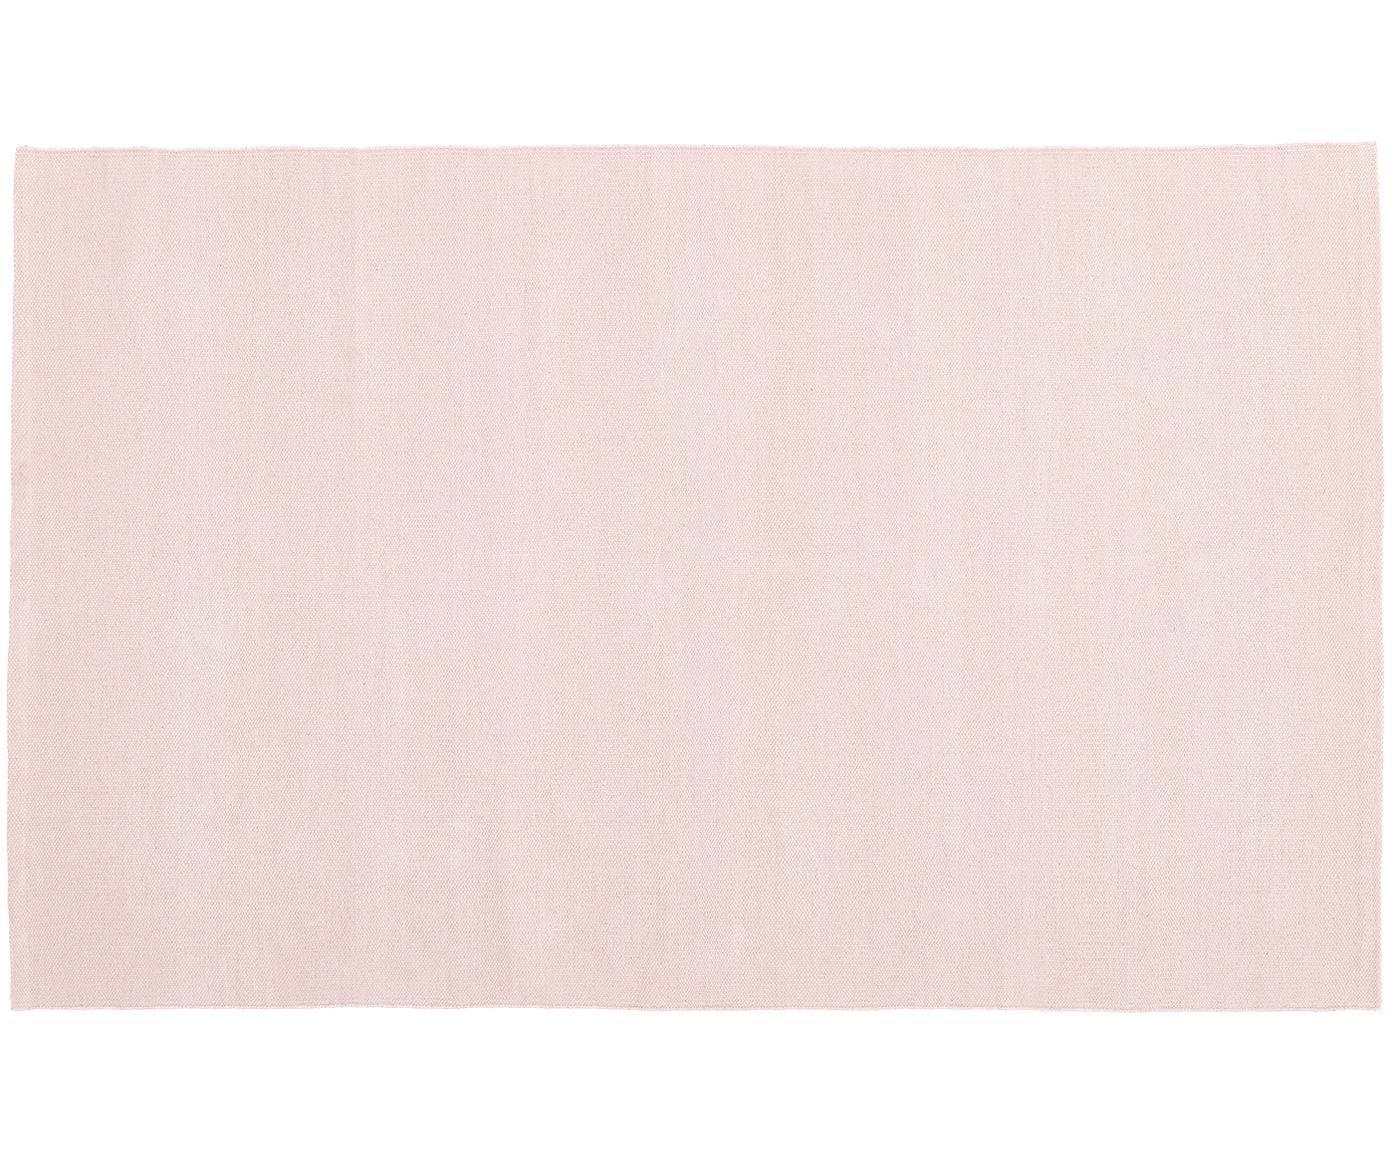 Dünner Baumwollteppich Agneta, handgewebt, 100% Baumwolle, Rosa, B 50 x L 80 cm (Größe XXS)